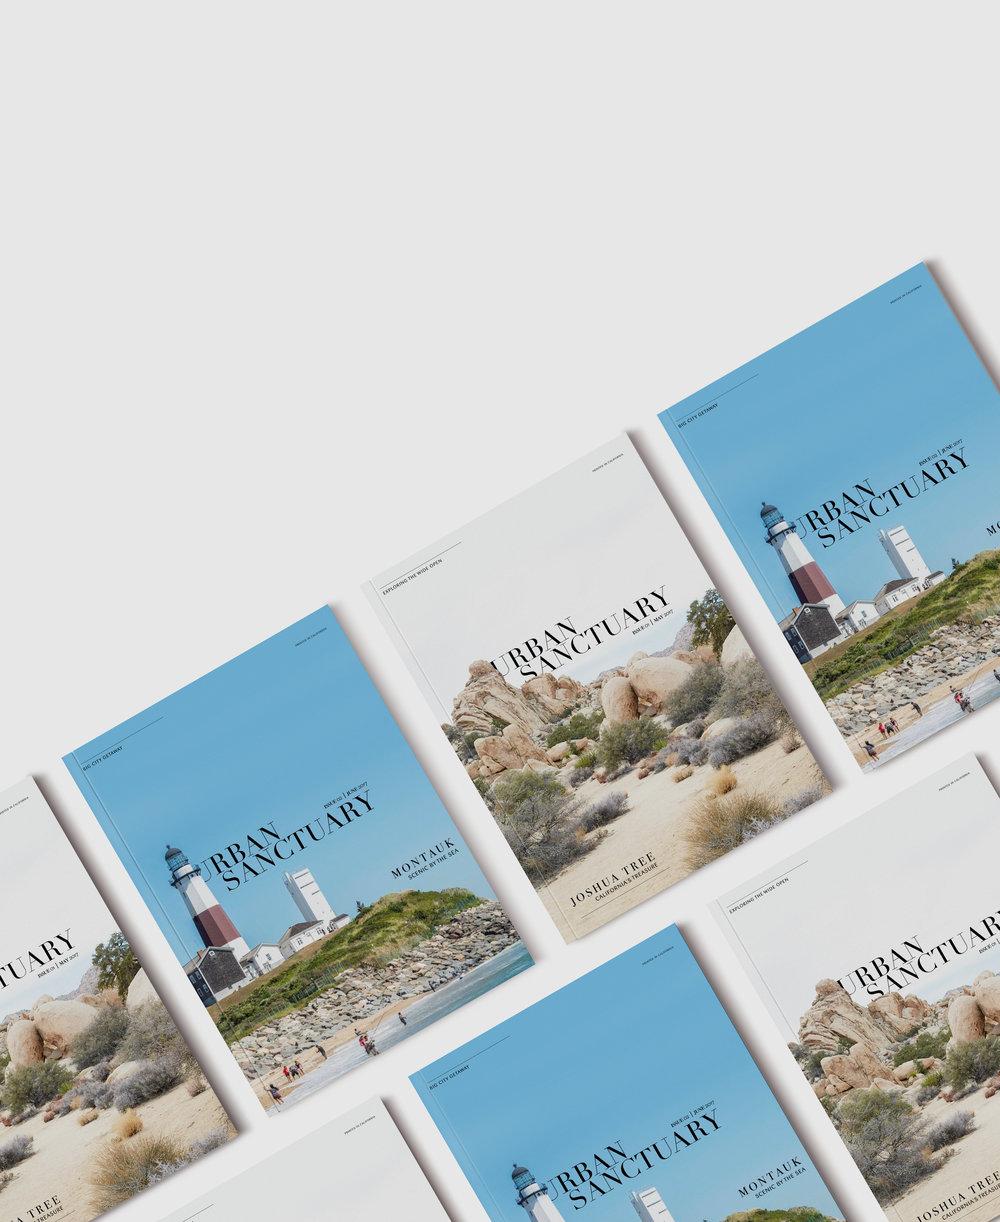 Urban Sanctuary Journal